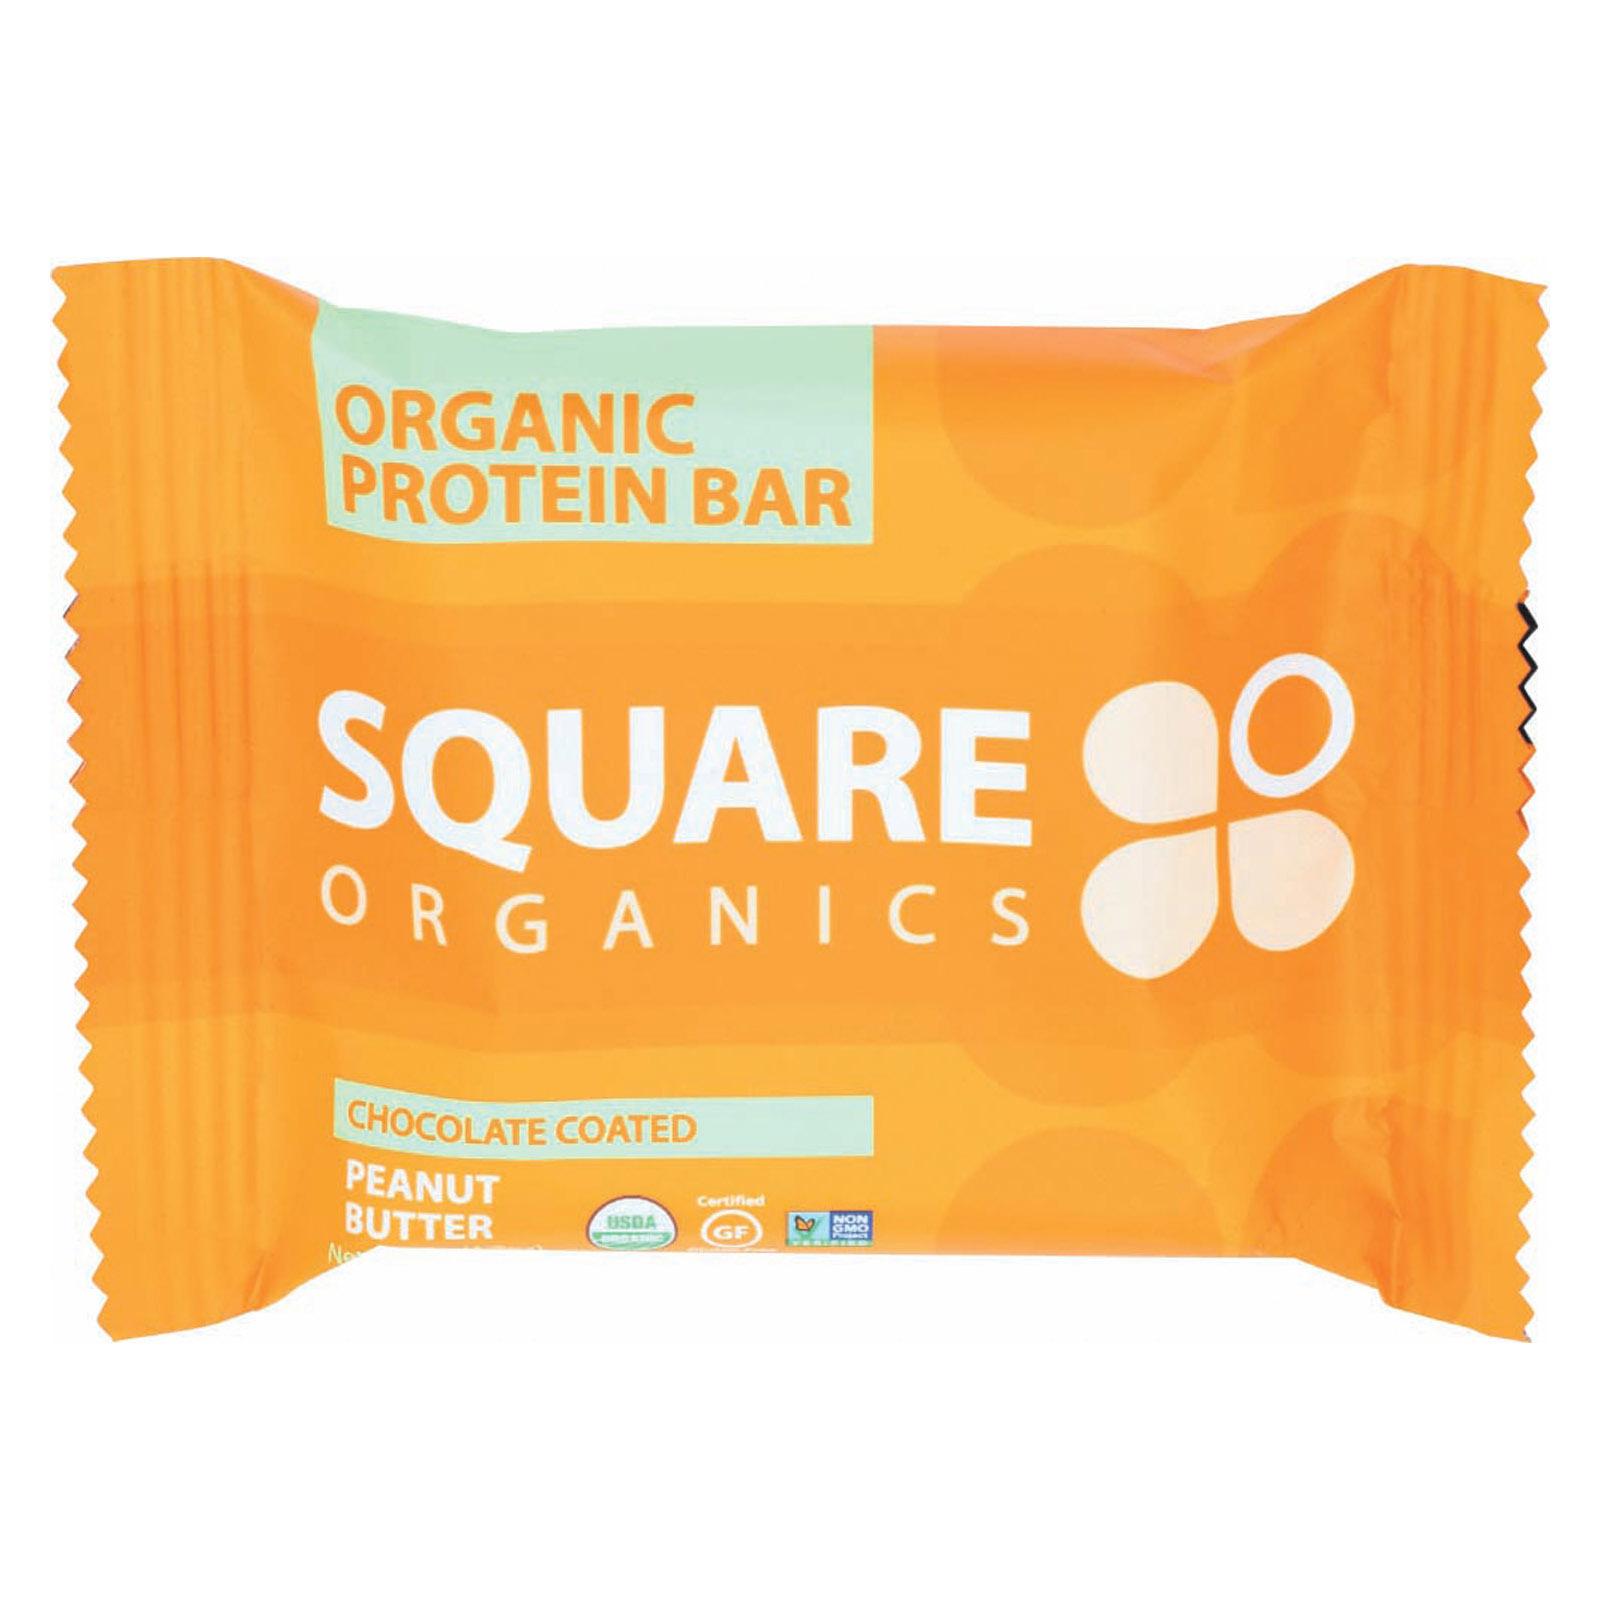 Square Organics Organic Protein Bar - Chocolate Coated Peanut Butter - Case of 12 - 1.7 oz